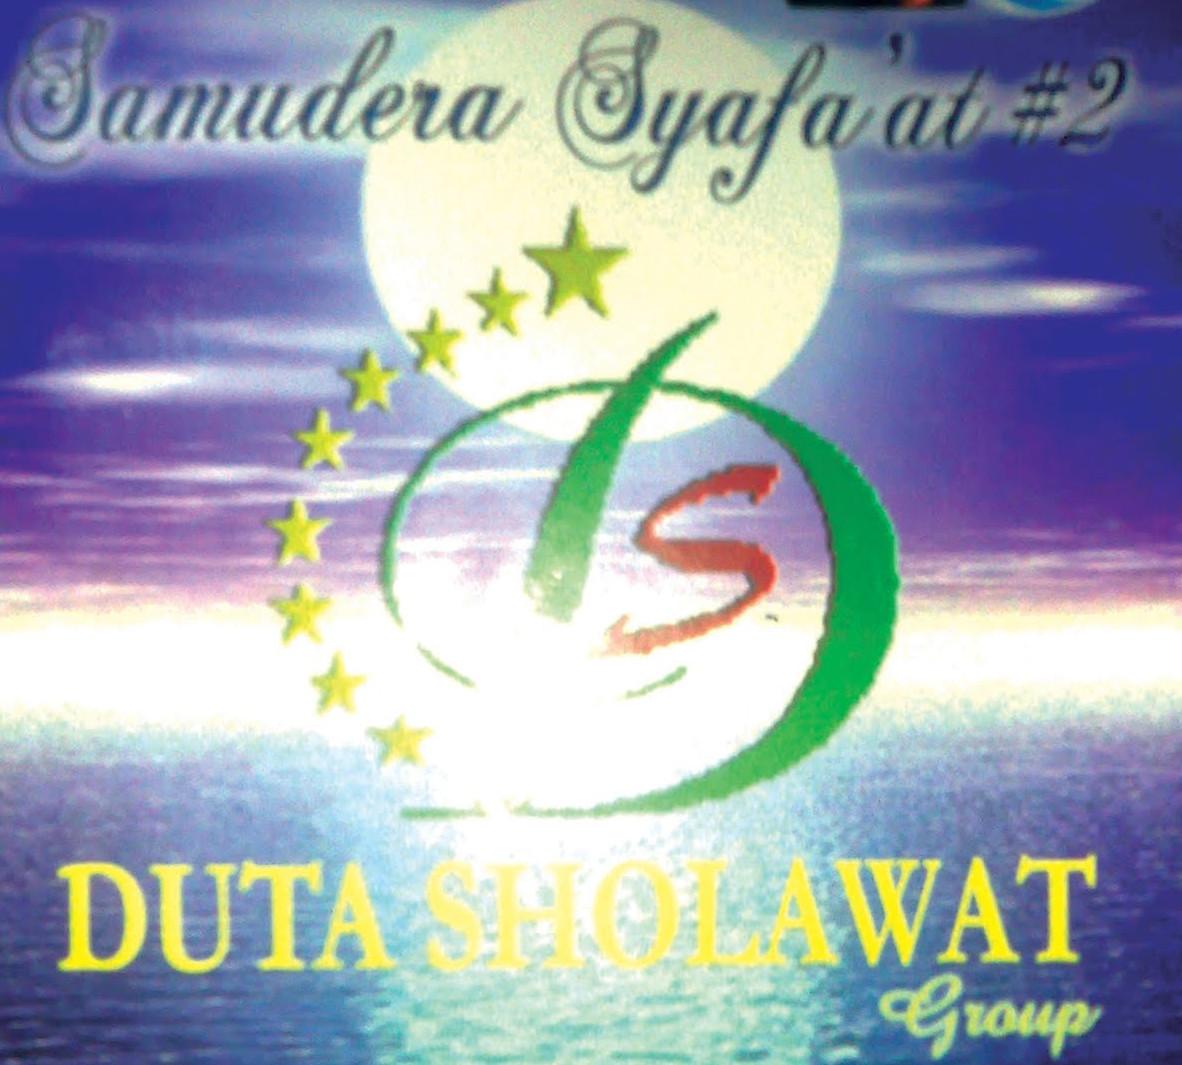 download kumpulan lagu duta sholawat samudera syafaat 2 full album